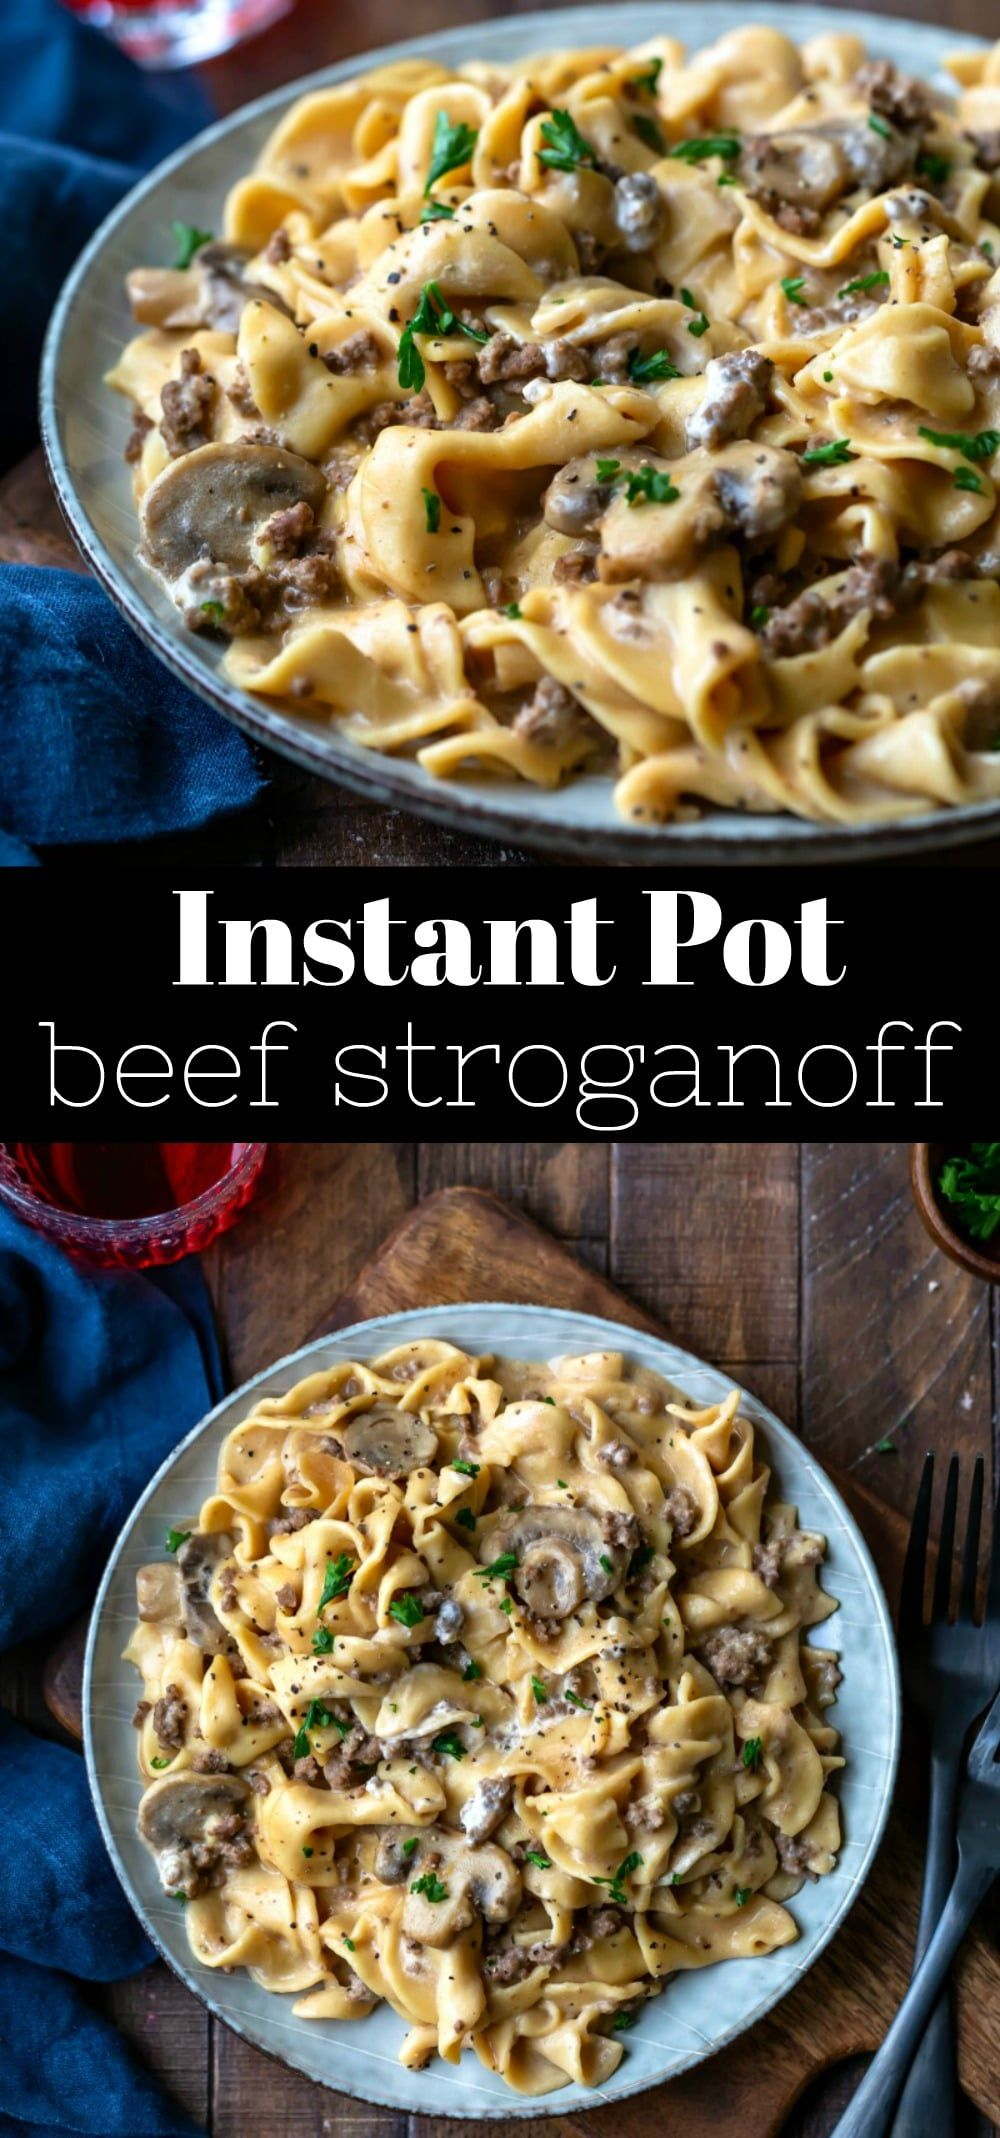 Instant Pot Beef Stroganoff I Heart Eating Recipe In 2020 Instant Pot Dinner Recipes Beef Stroganoff Instant Pot Recipe Beef Stroganoff Easy